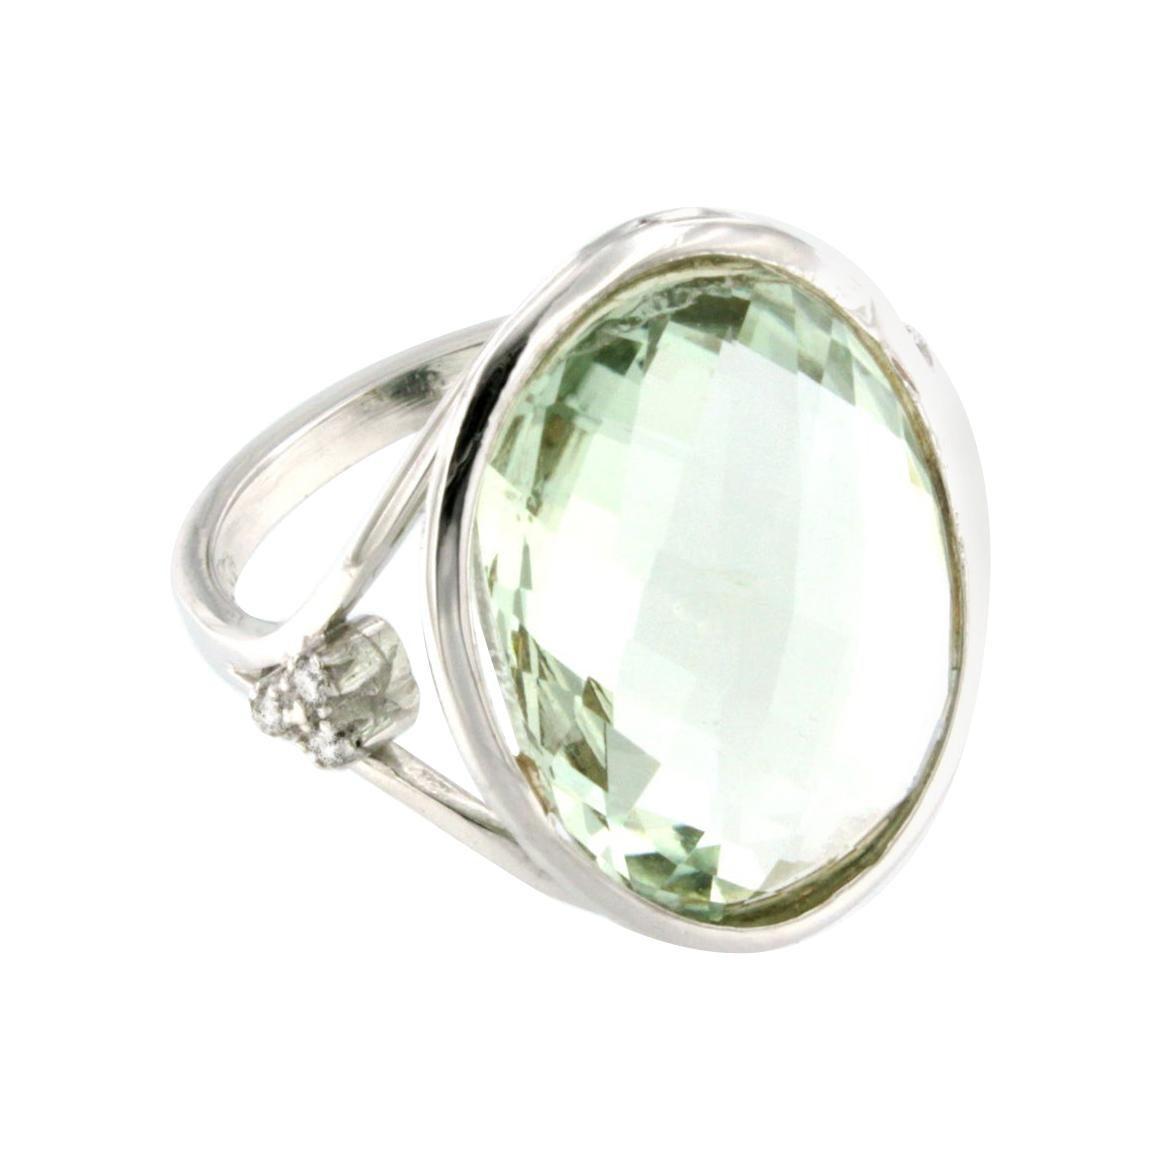 18k White Gold with Prasiolite and White Diamonds Ring